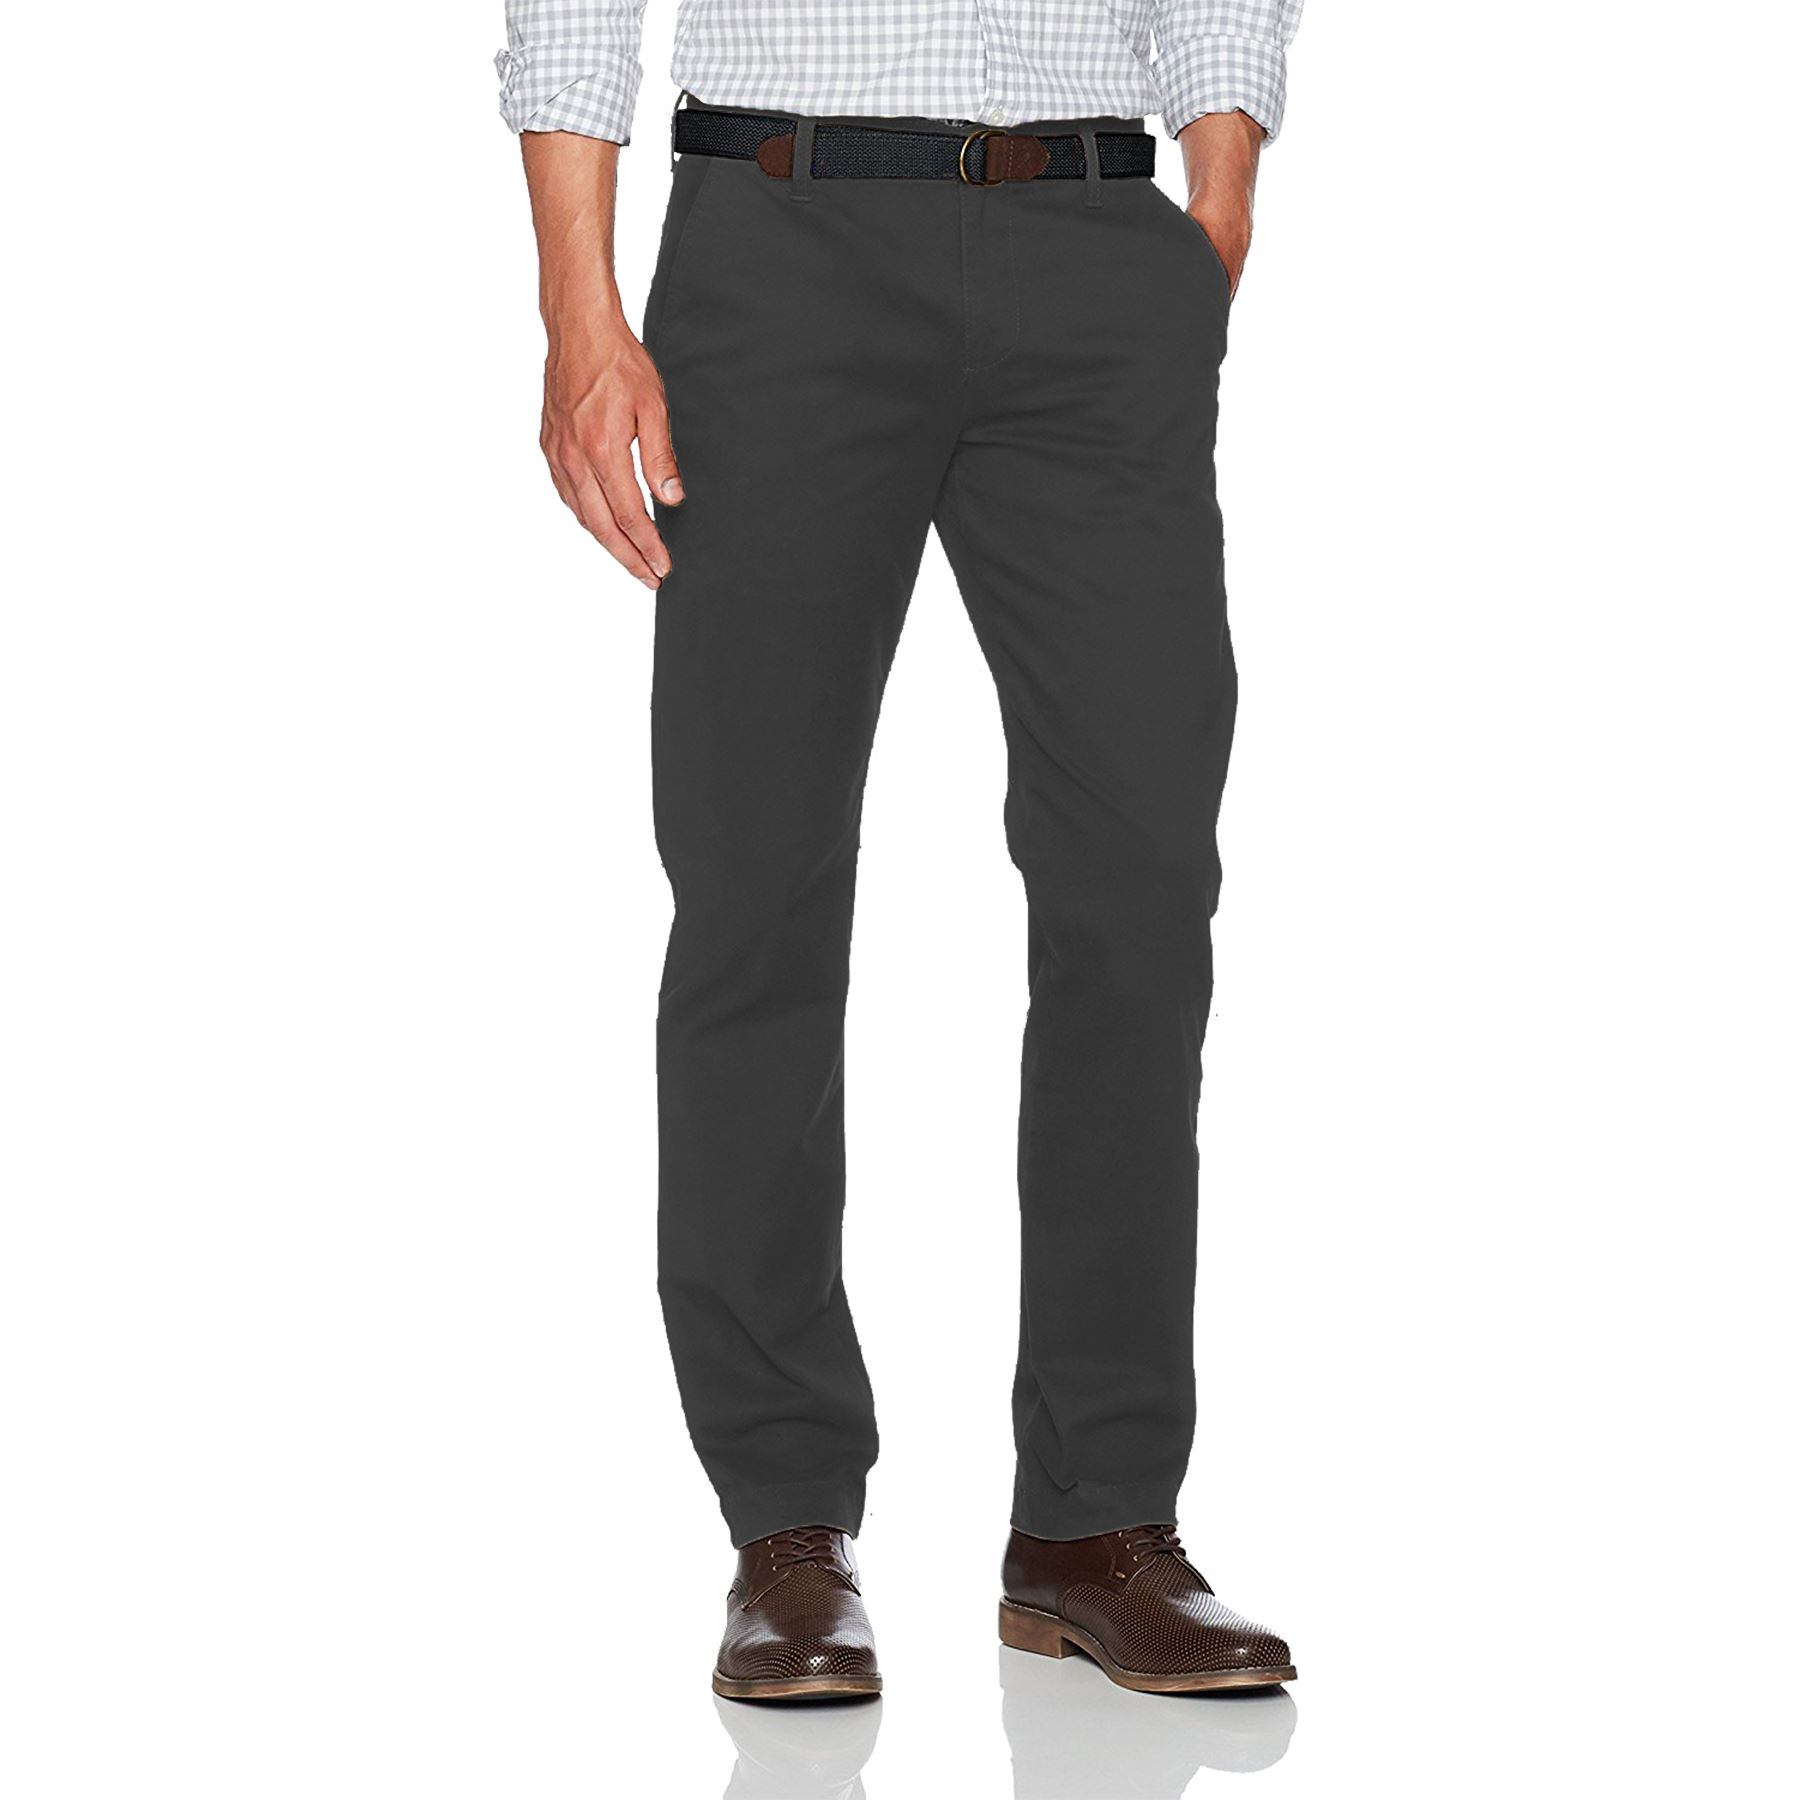 Para-Hombres-Pantalones-Regular-Fit-Straight-Chino-De-Algodon-Informales-Pantalones-de-trabajo miniatura 6